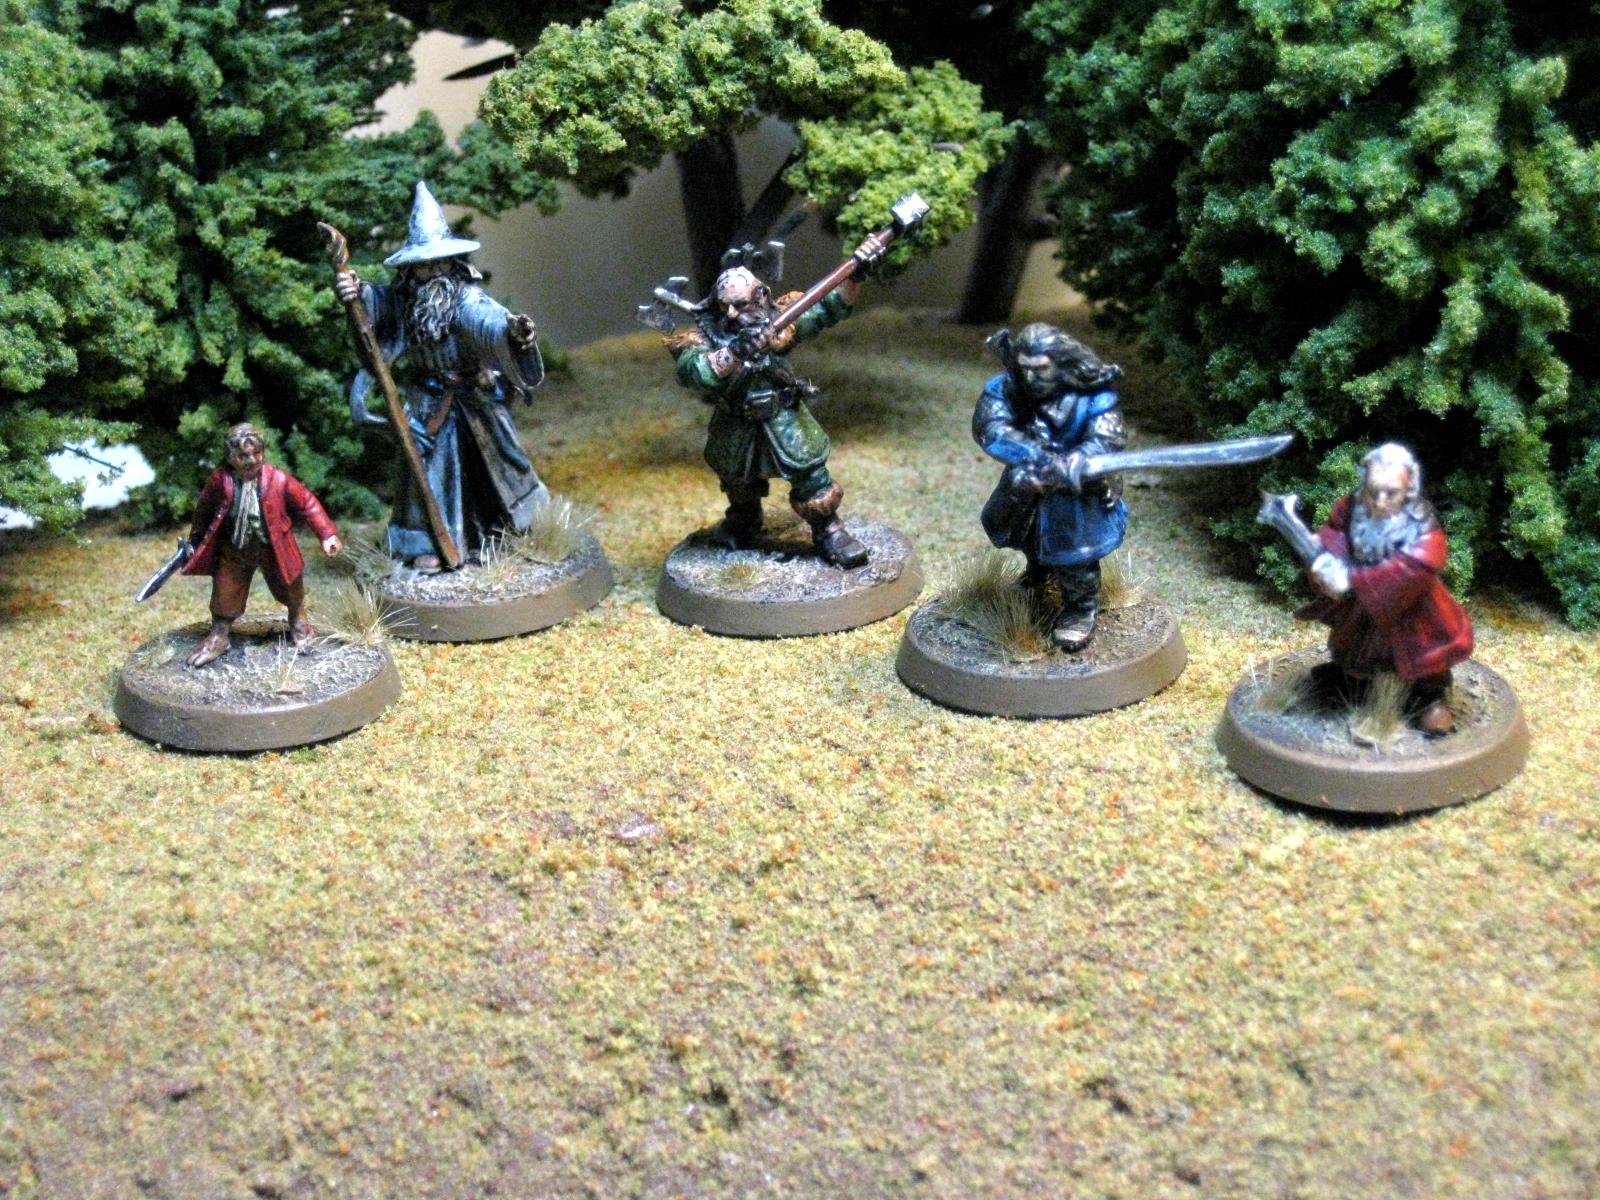 Balin, Bilbo, Dwalin, Gandalf The Grey, Hobbit, Lord Of The Rings, Thrin